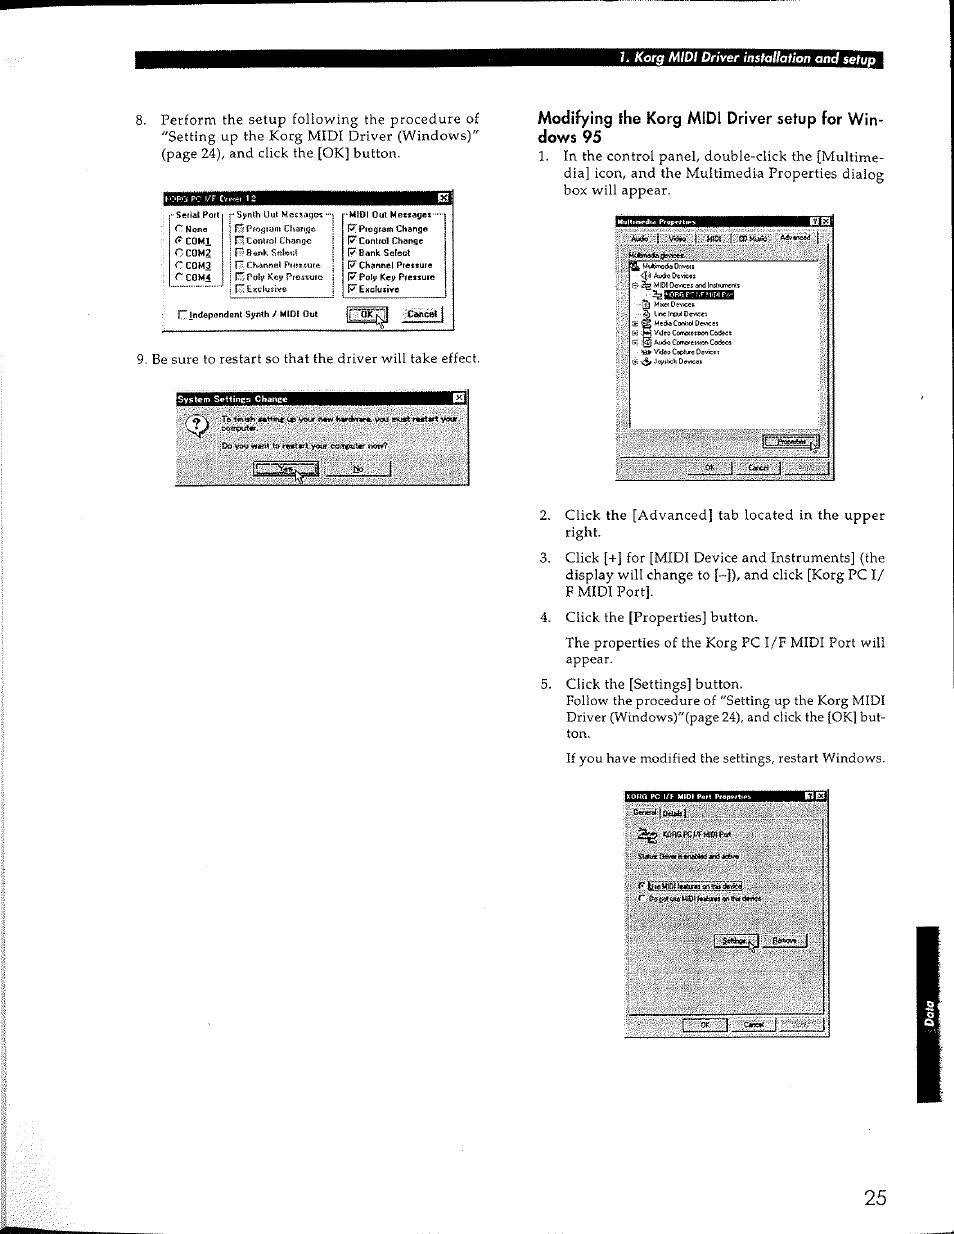 KORG Concert Korg Digital Piano C-150 User Manual | Page 25